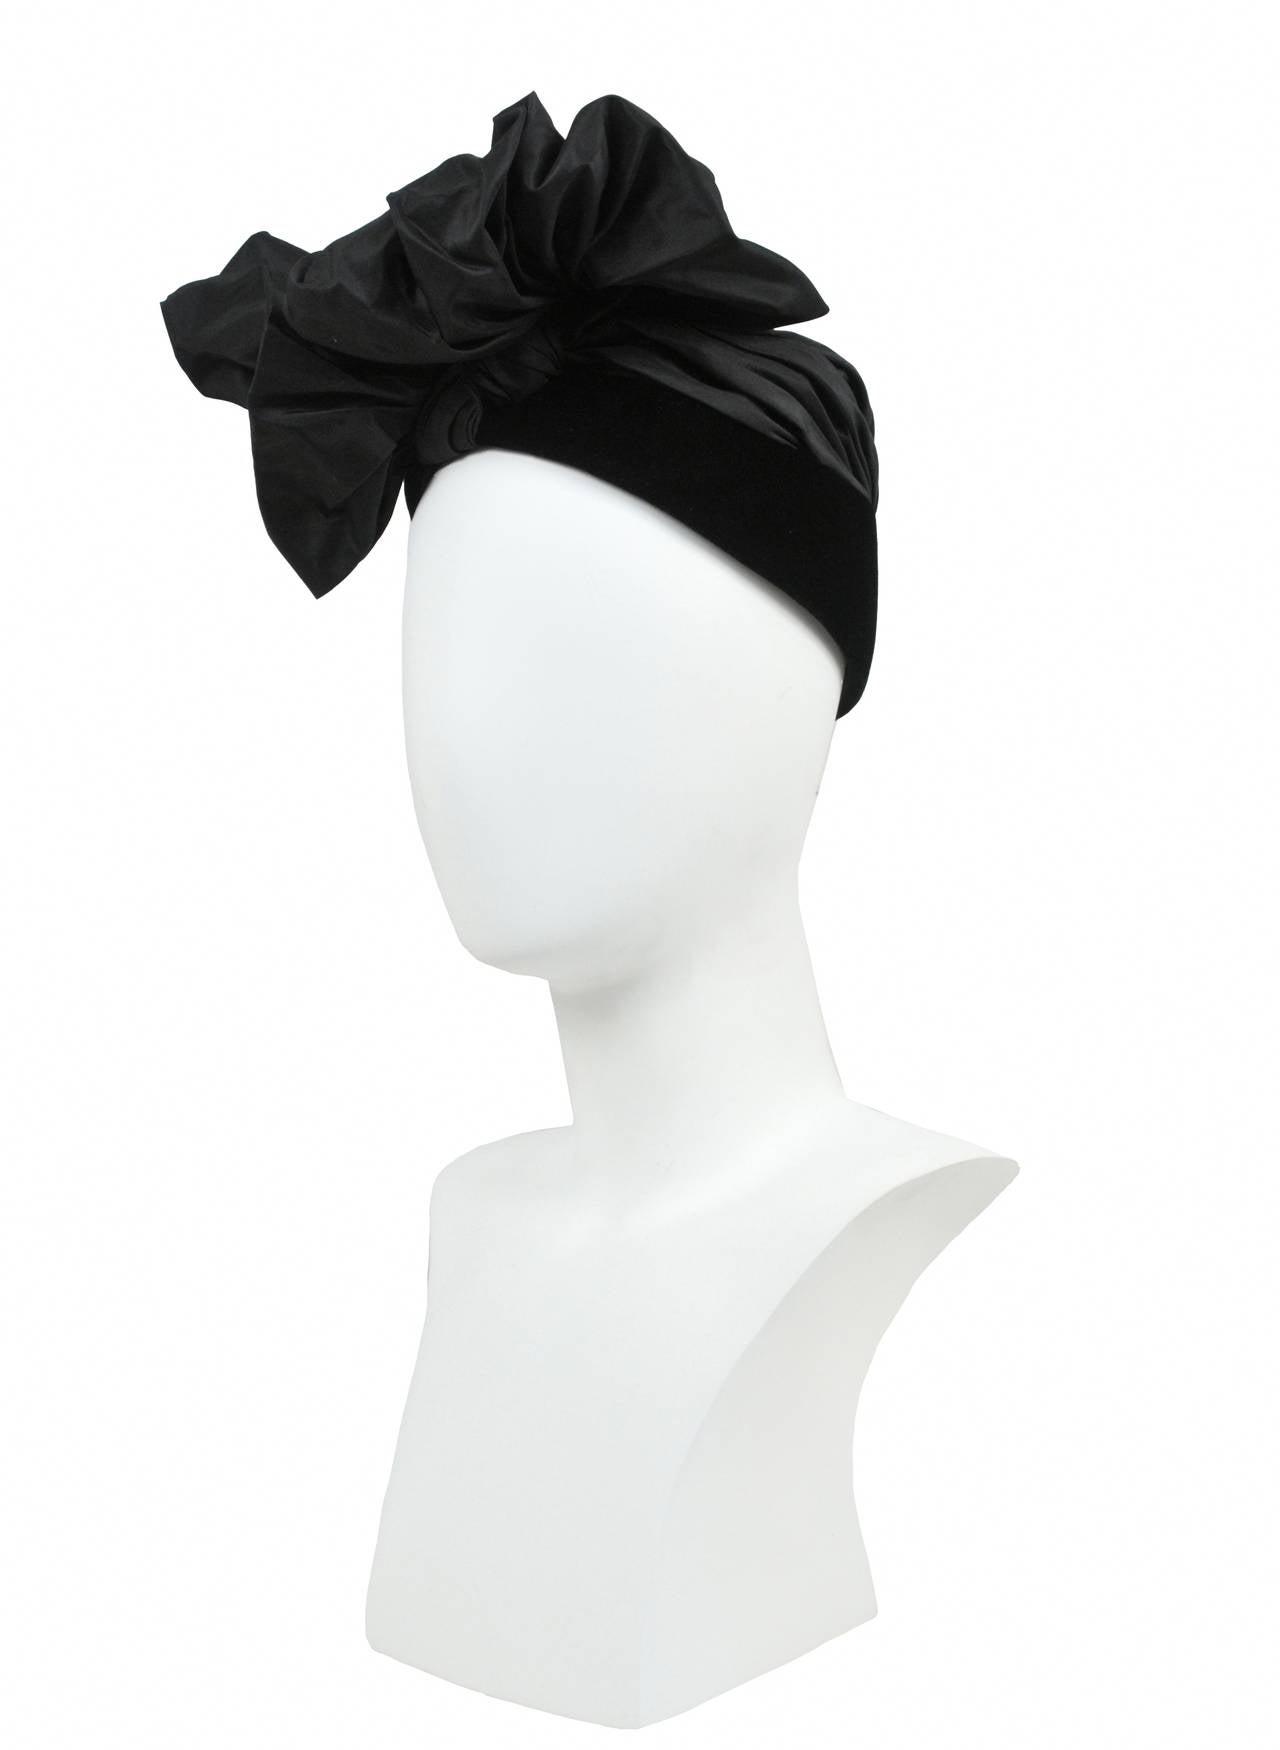 Iconic Saint Laurent Turban Hat 2